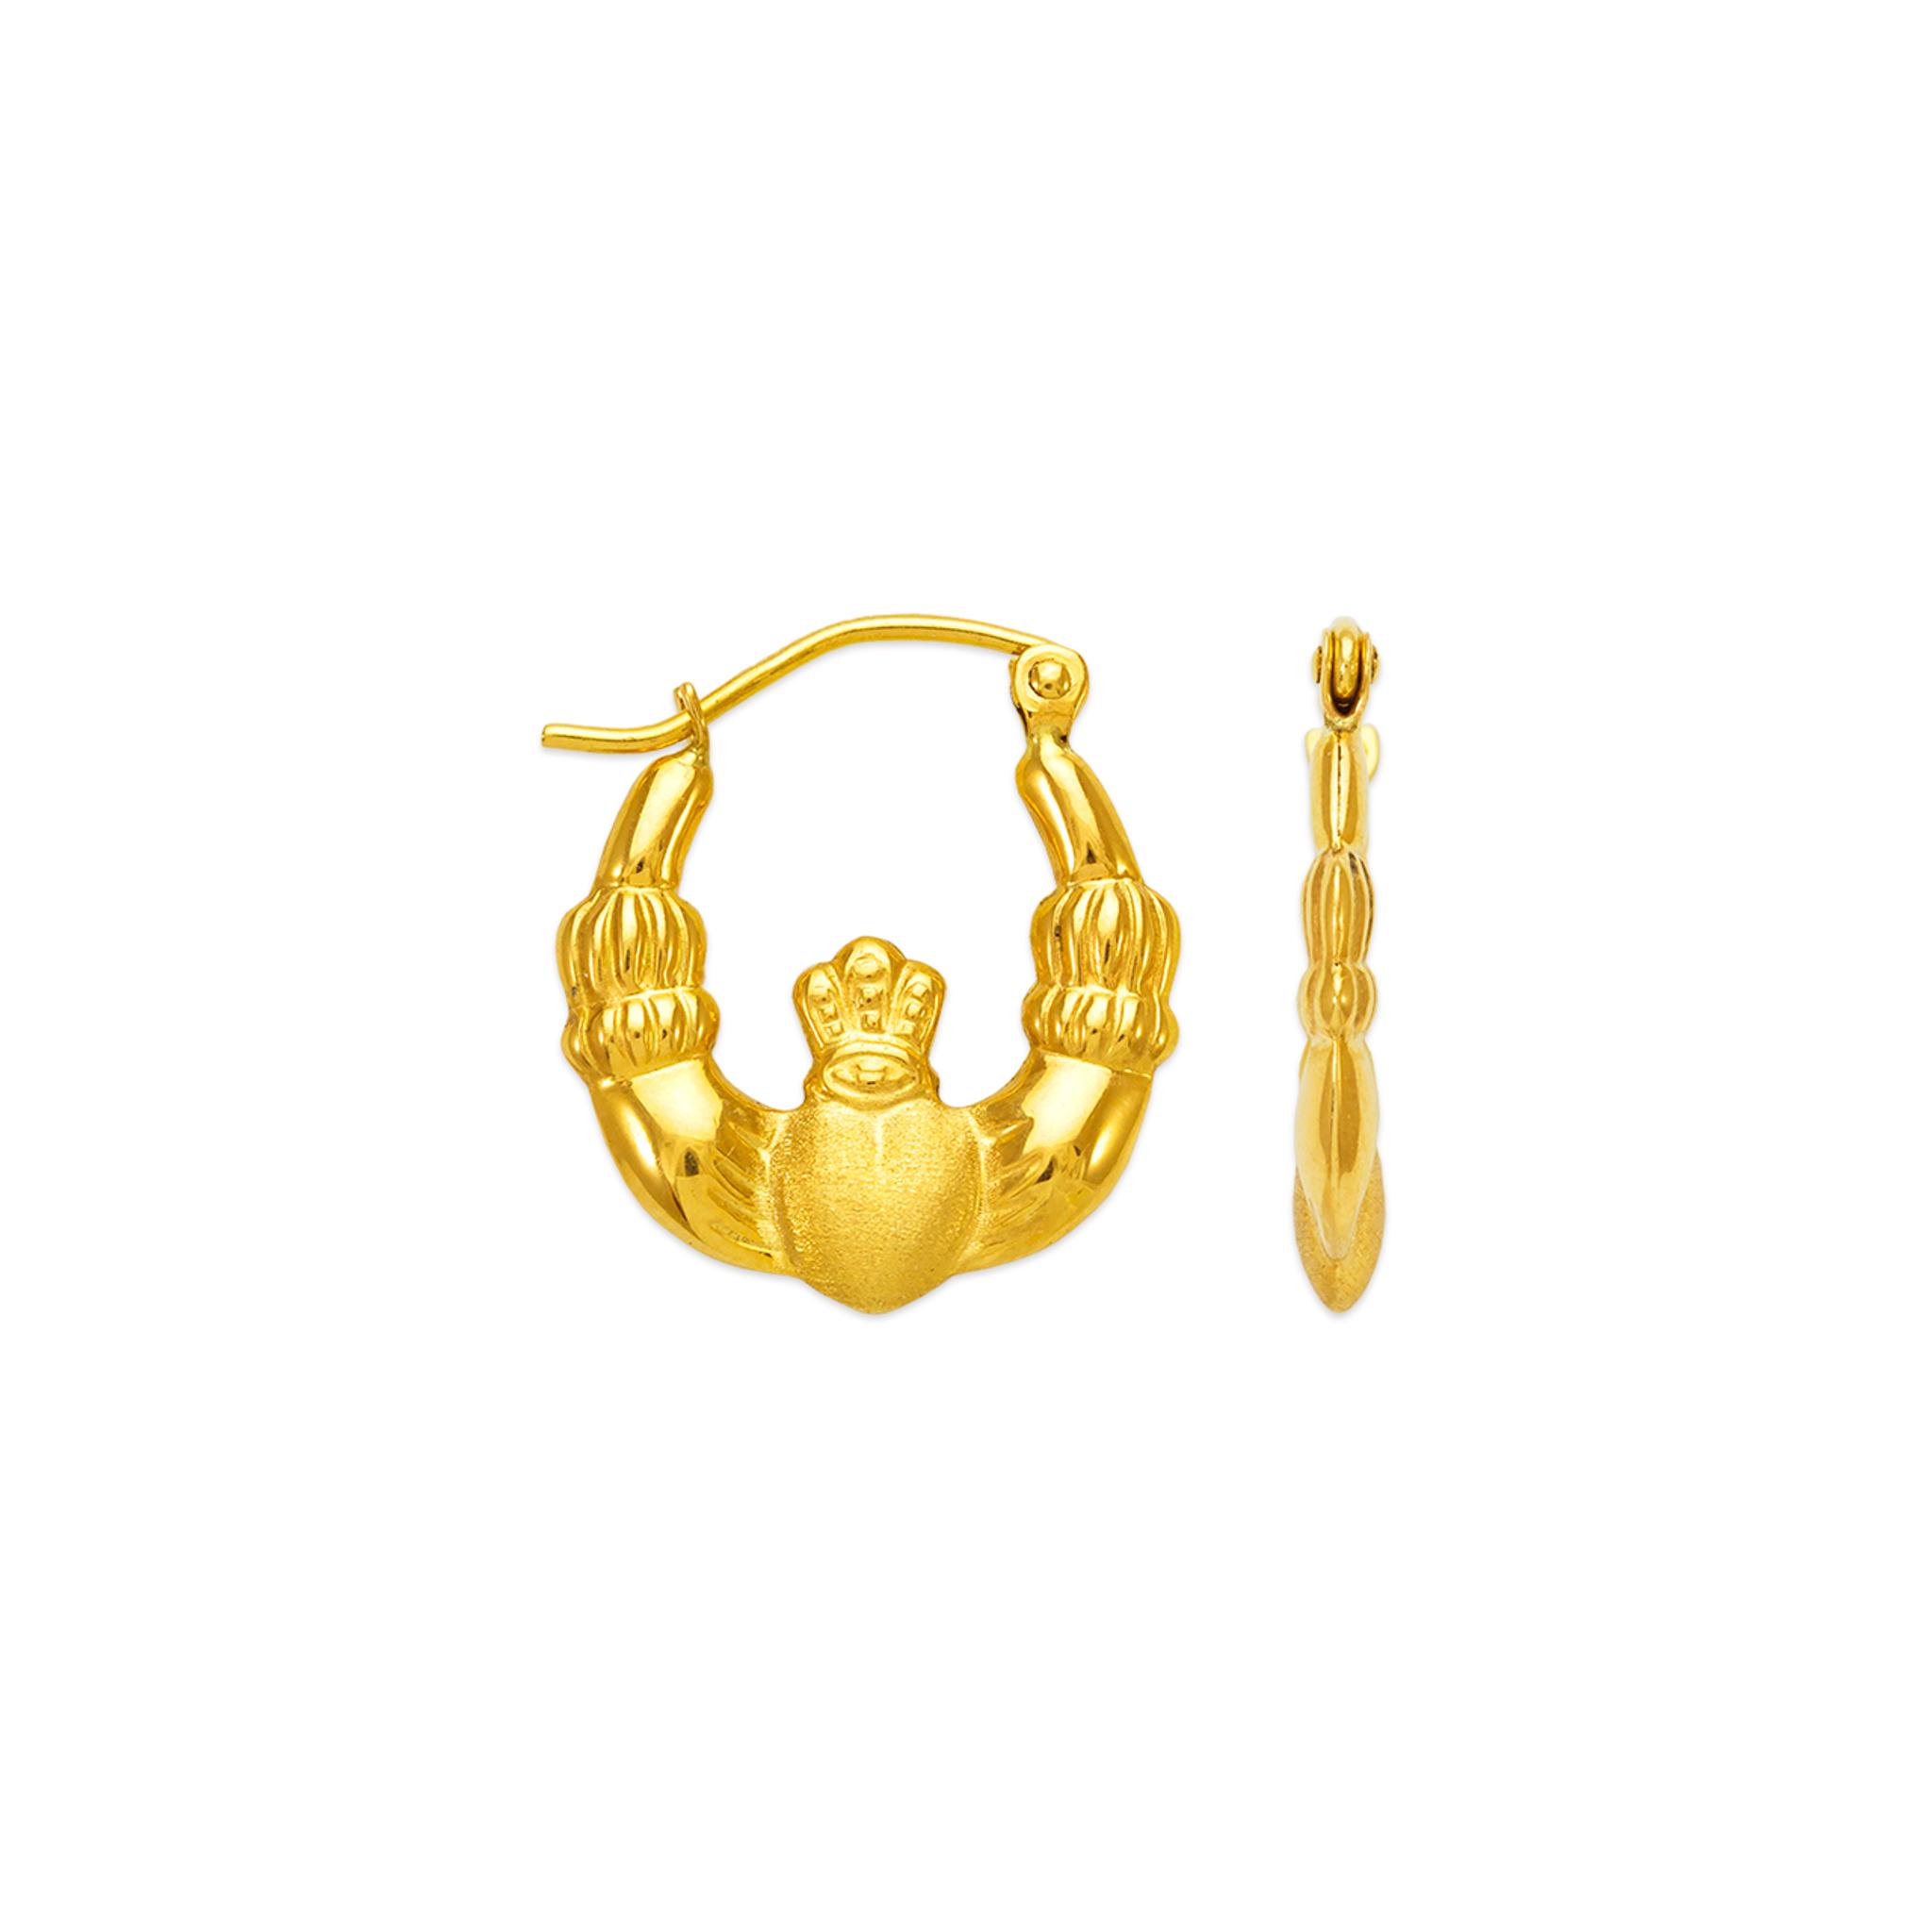 547 114 Hollow Shrimp Hoop Earrings Line Gold Inc